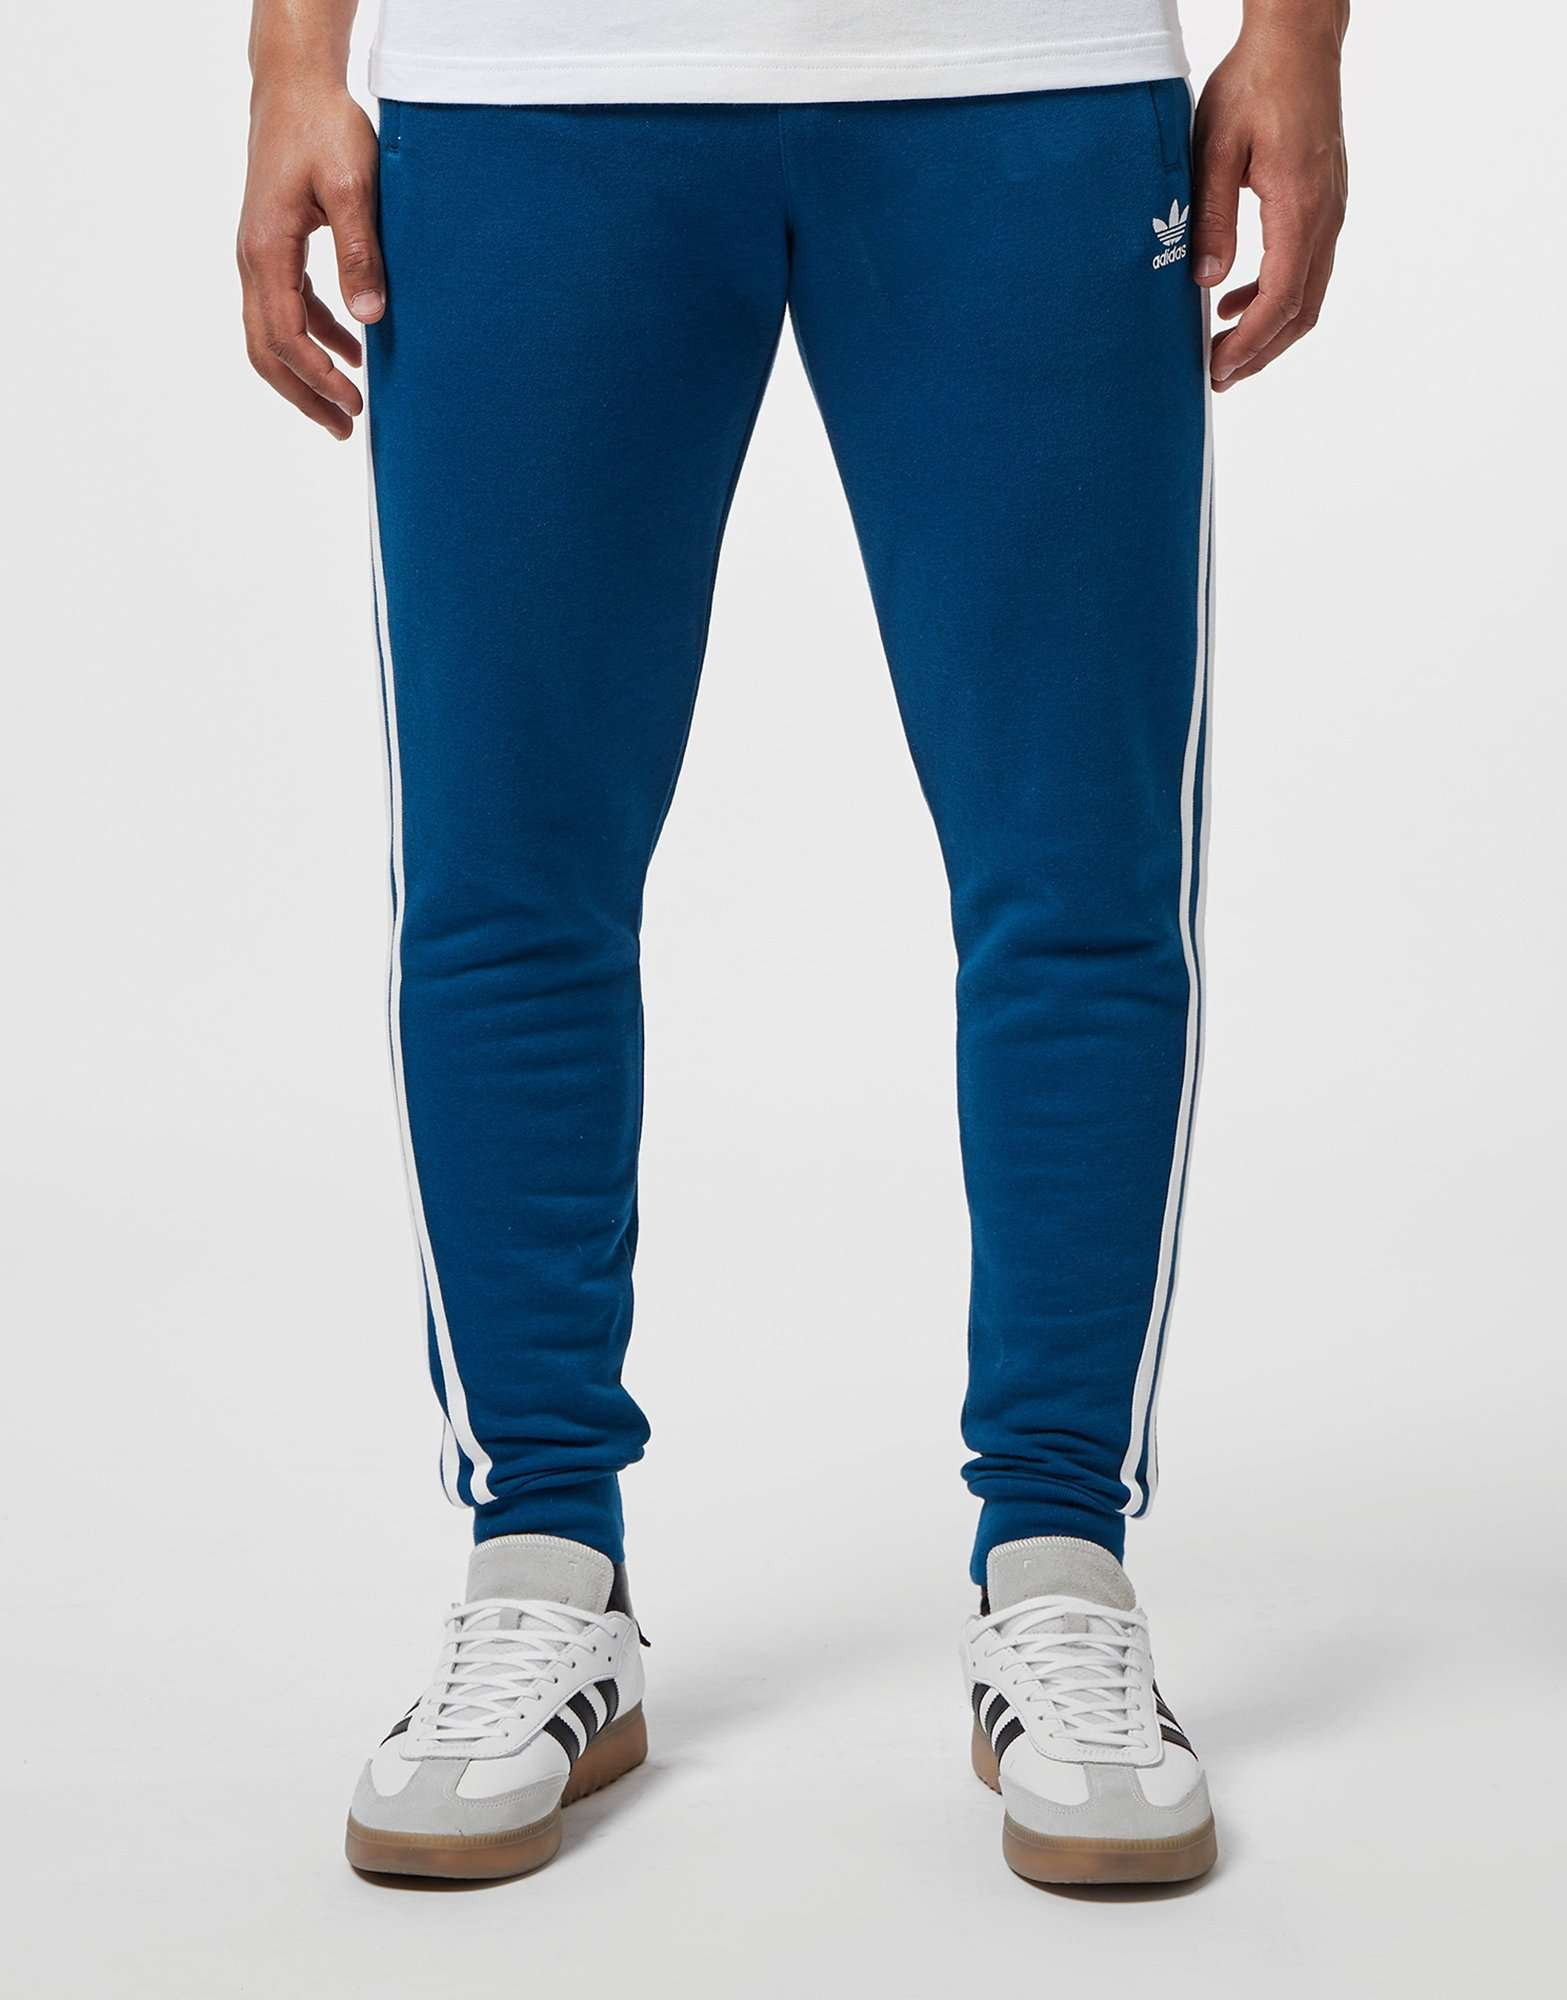 adidas Originals 3-Stripes Fleece Pants